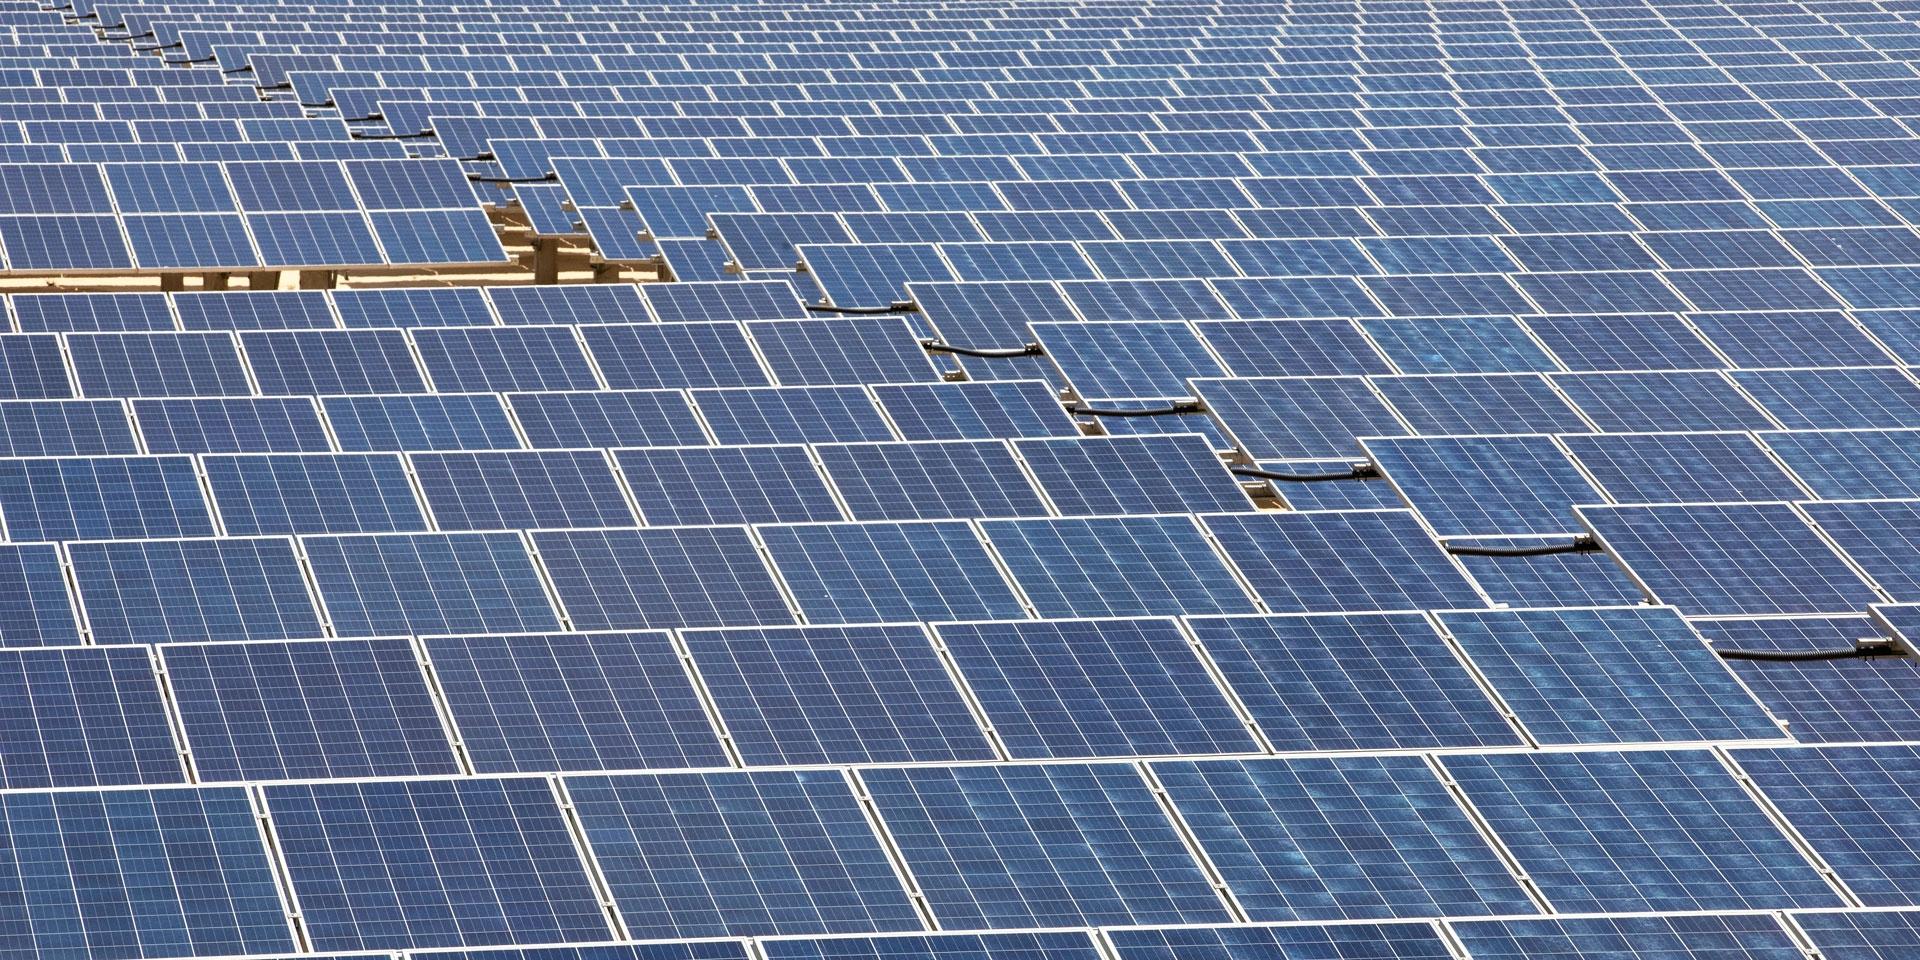 5056 sharp energy solar power plant